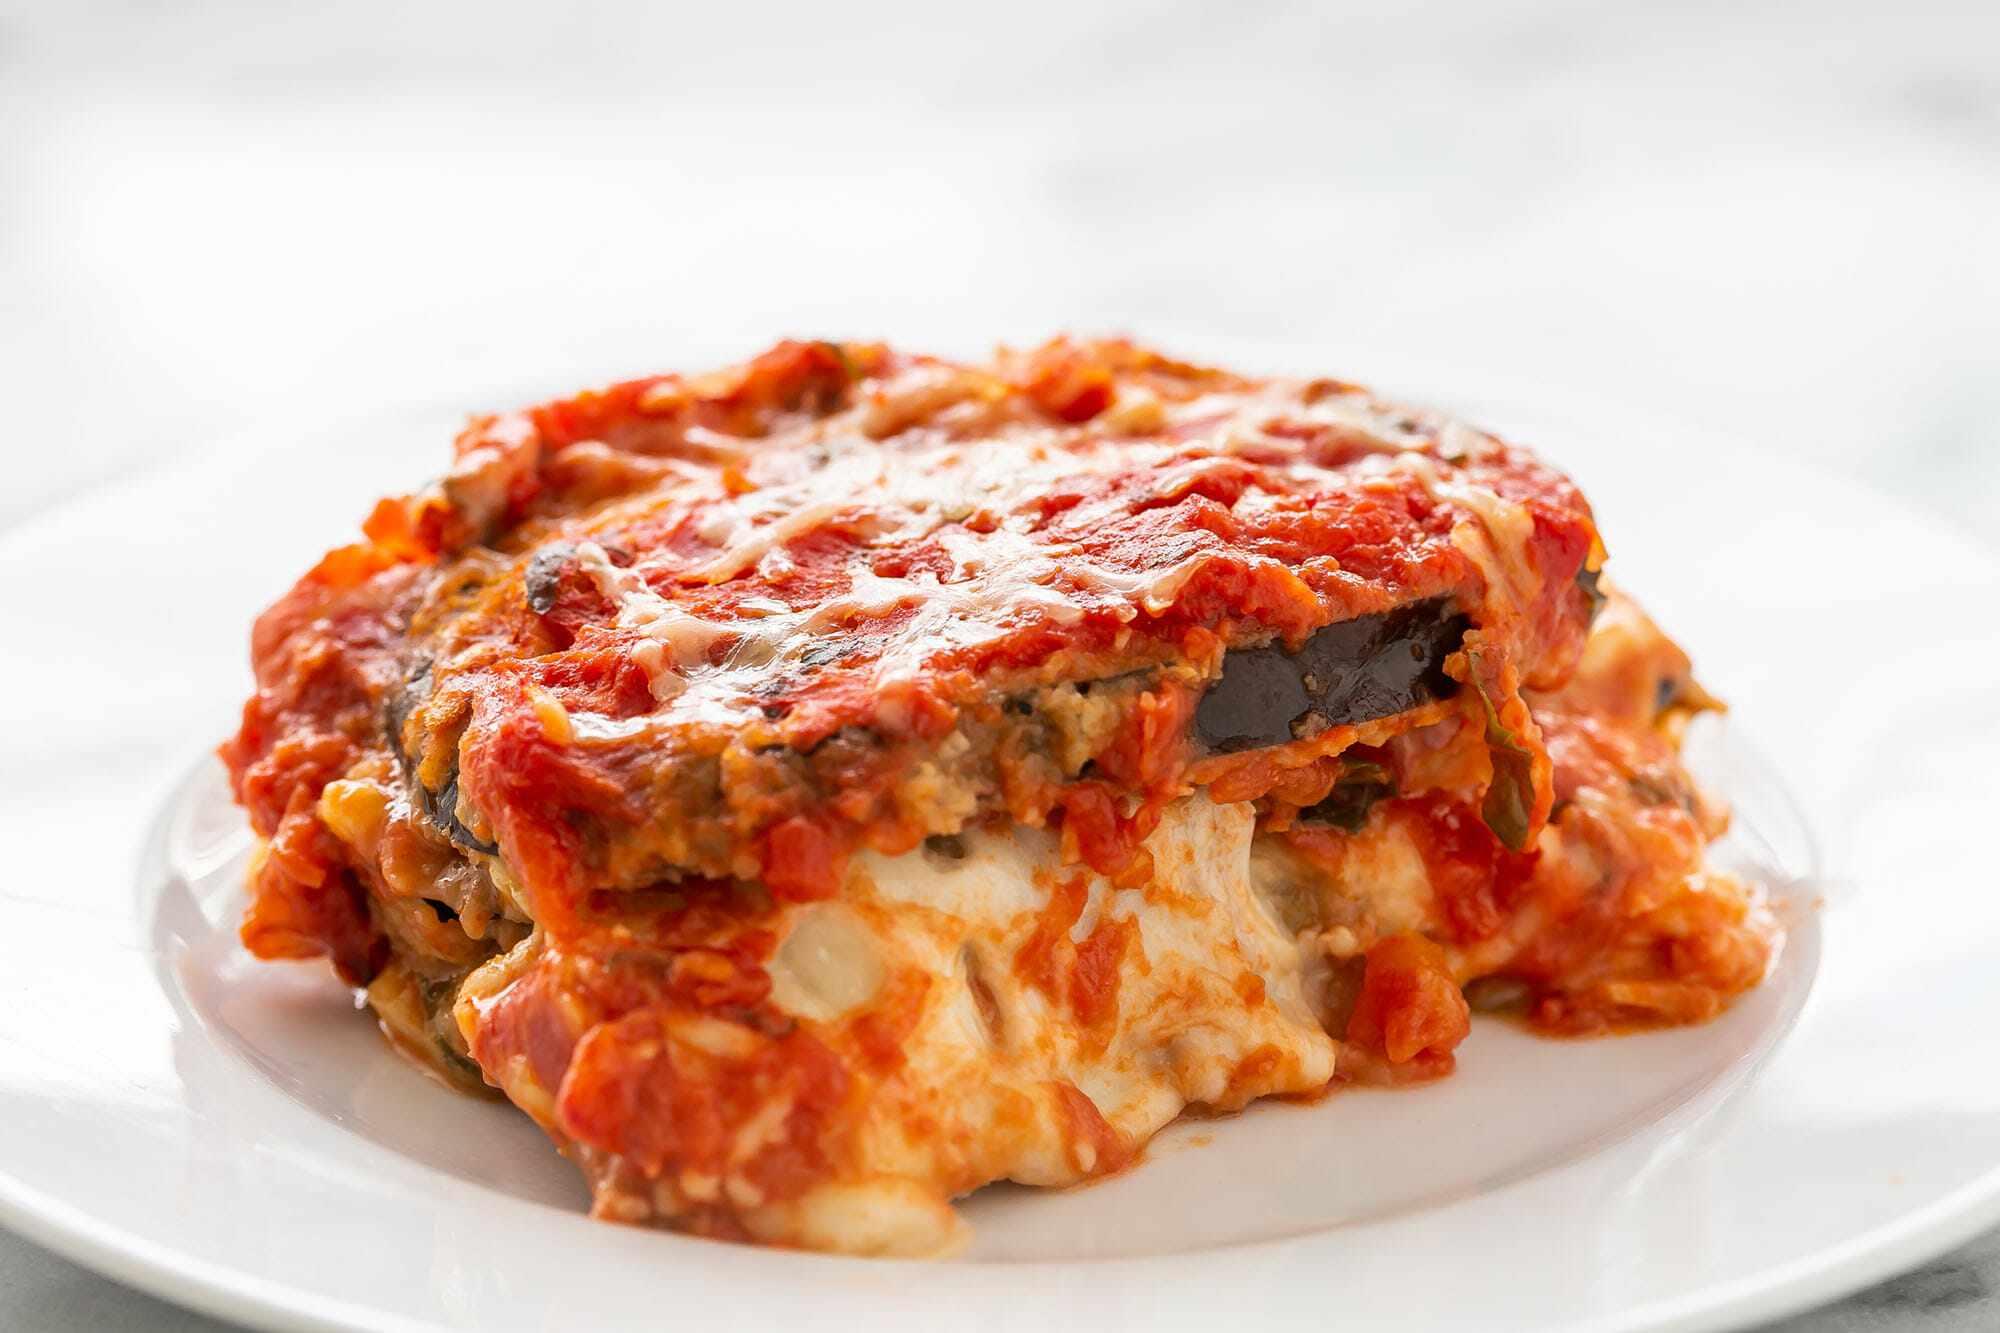 Slice of eggplant parmesan on a plate